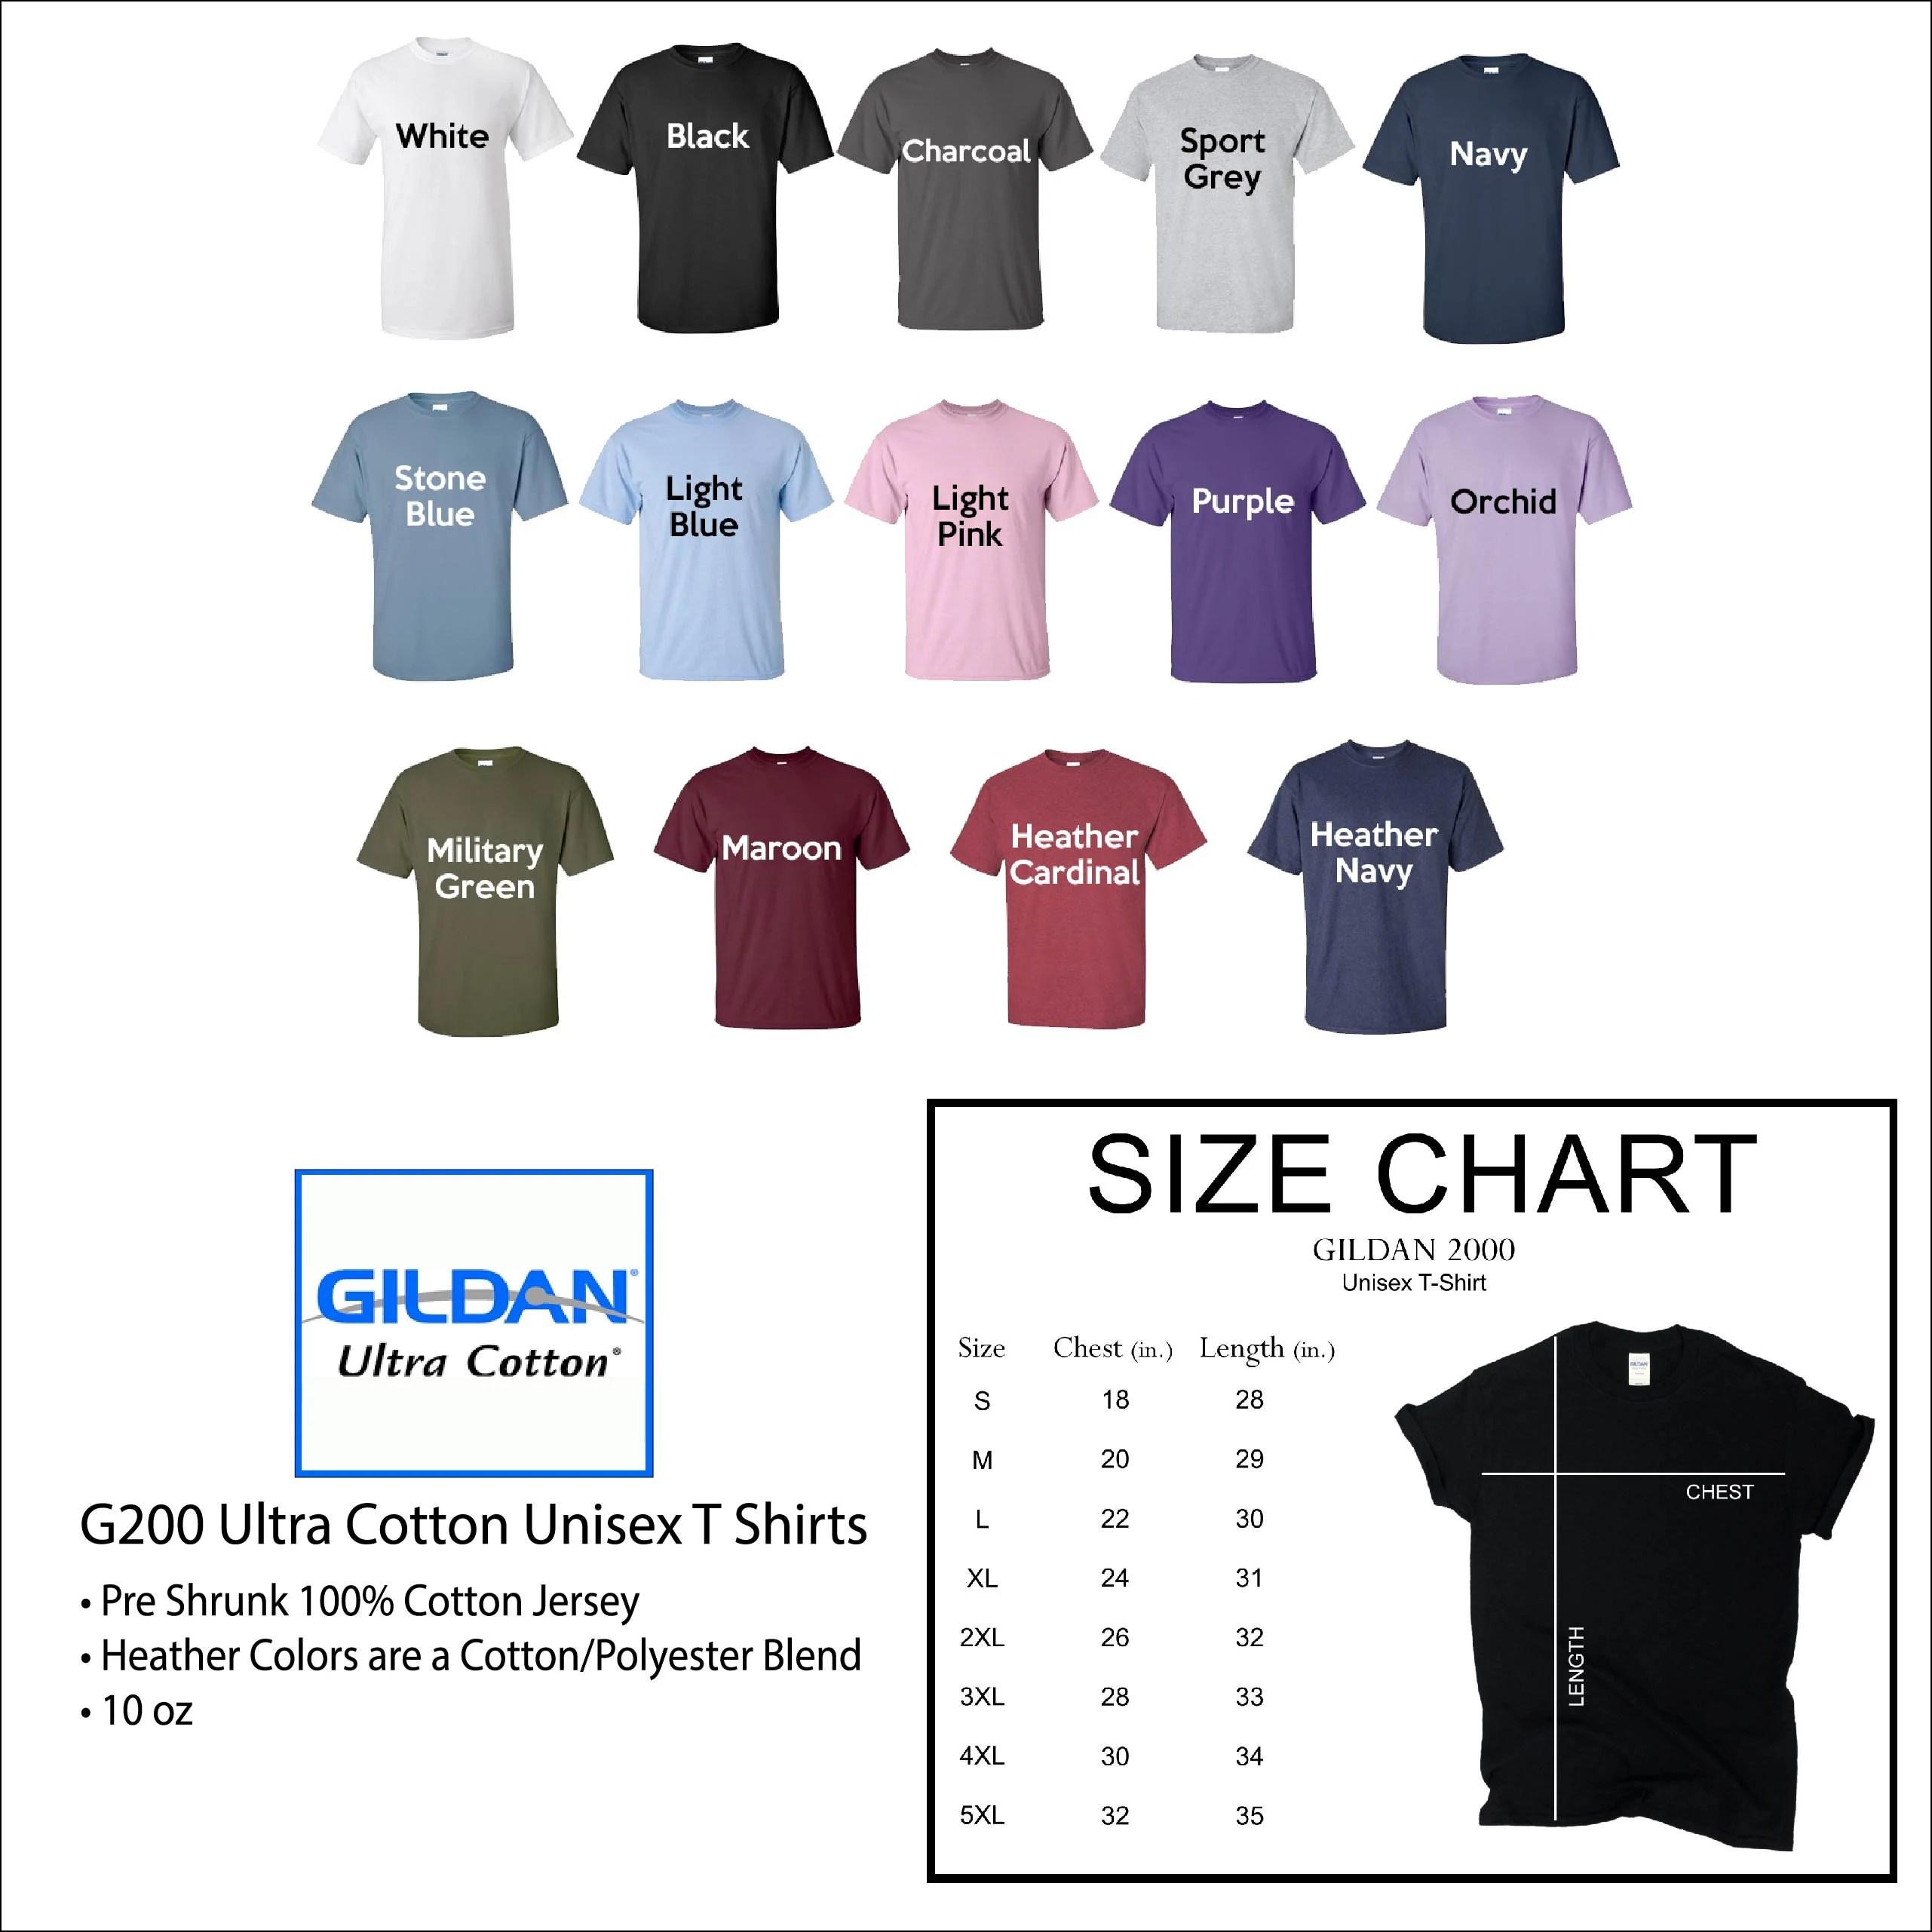 Personalized Nana T Shirt Personalized Gift For Nana Custom image 4